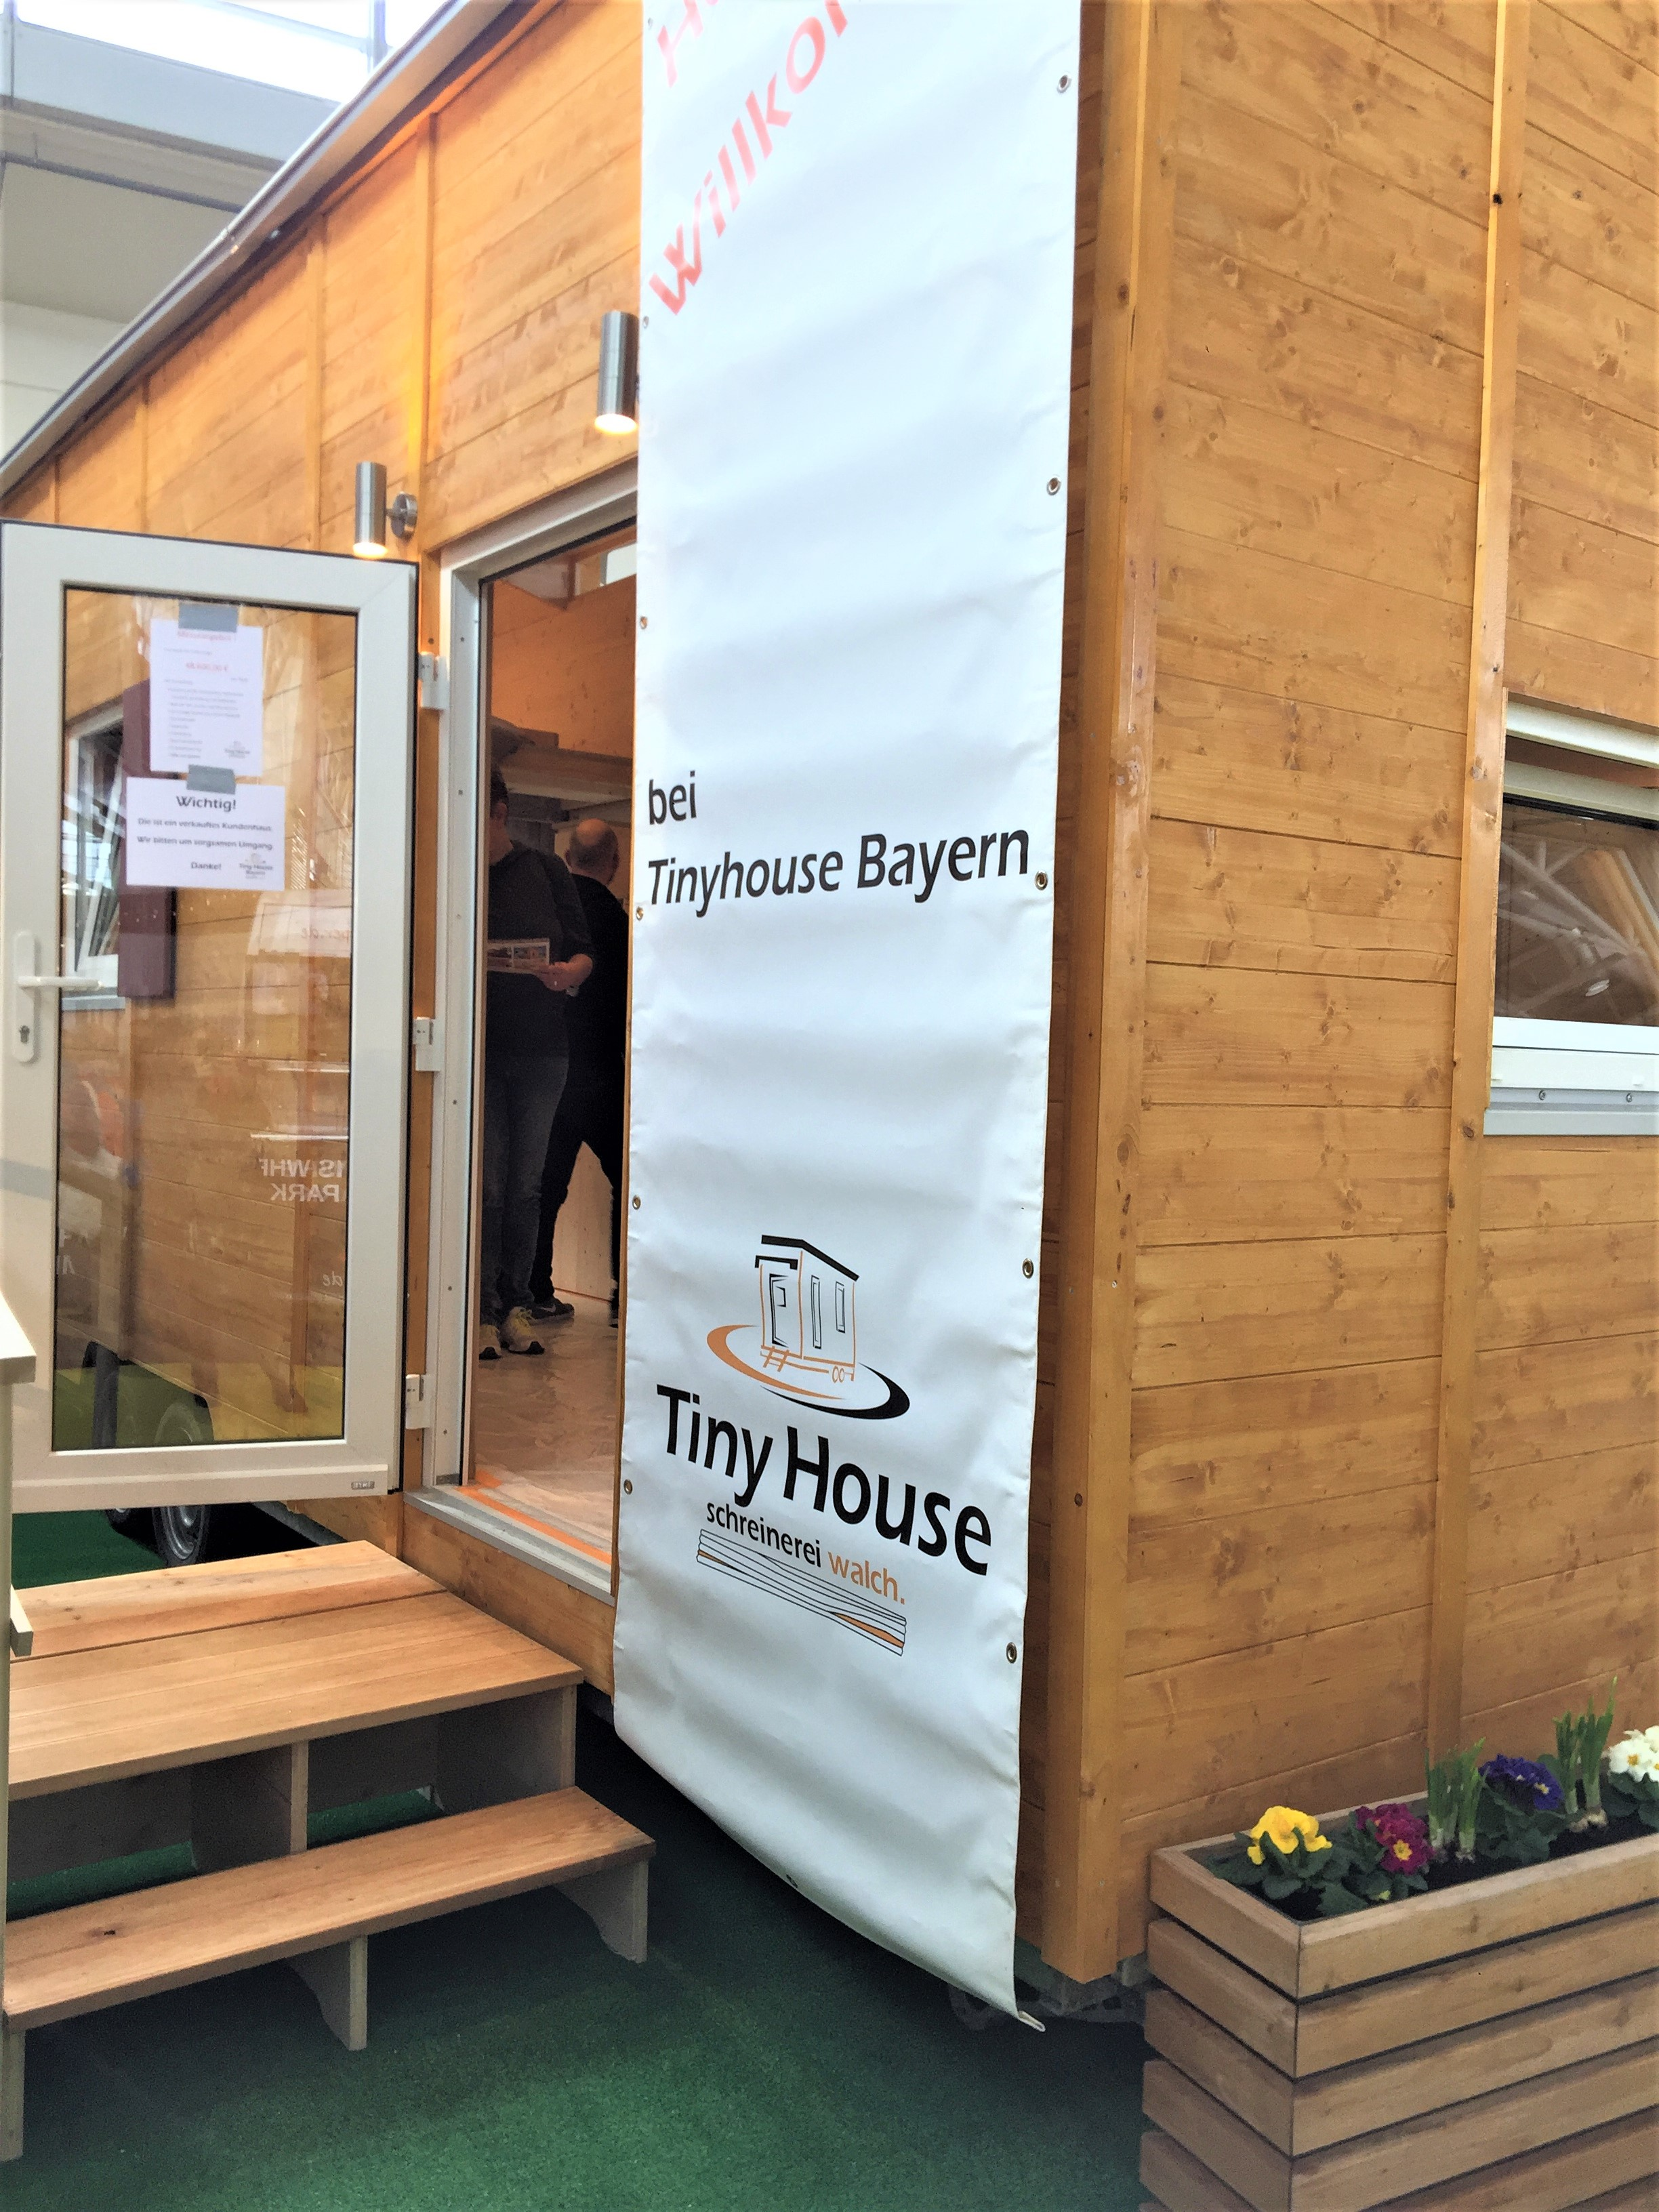 Tiny House München free Reisemesse